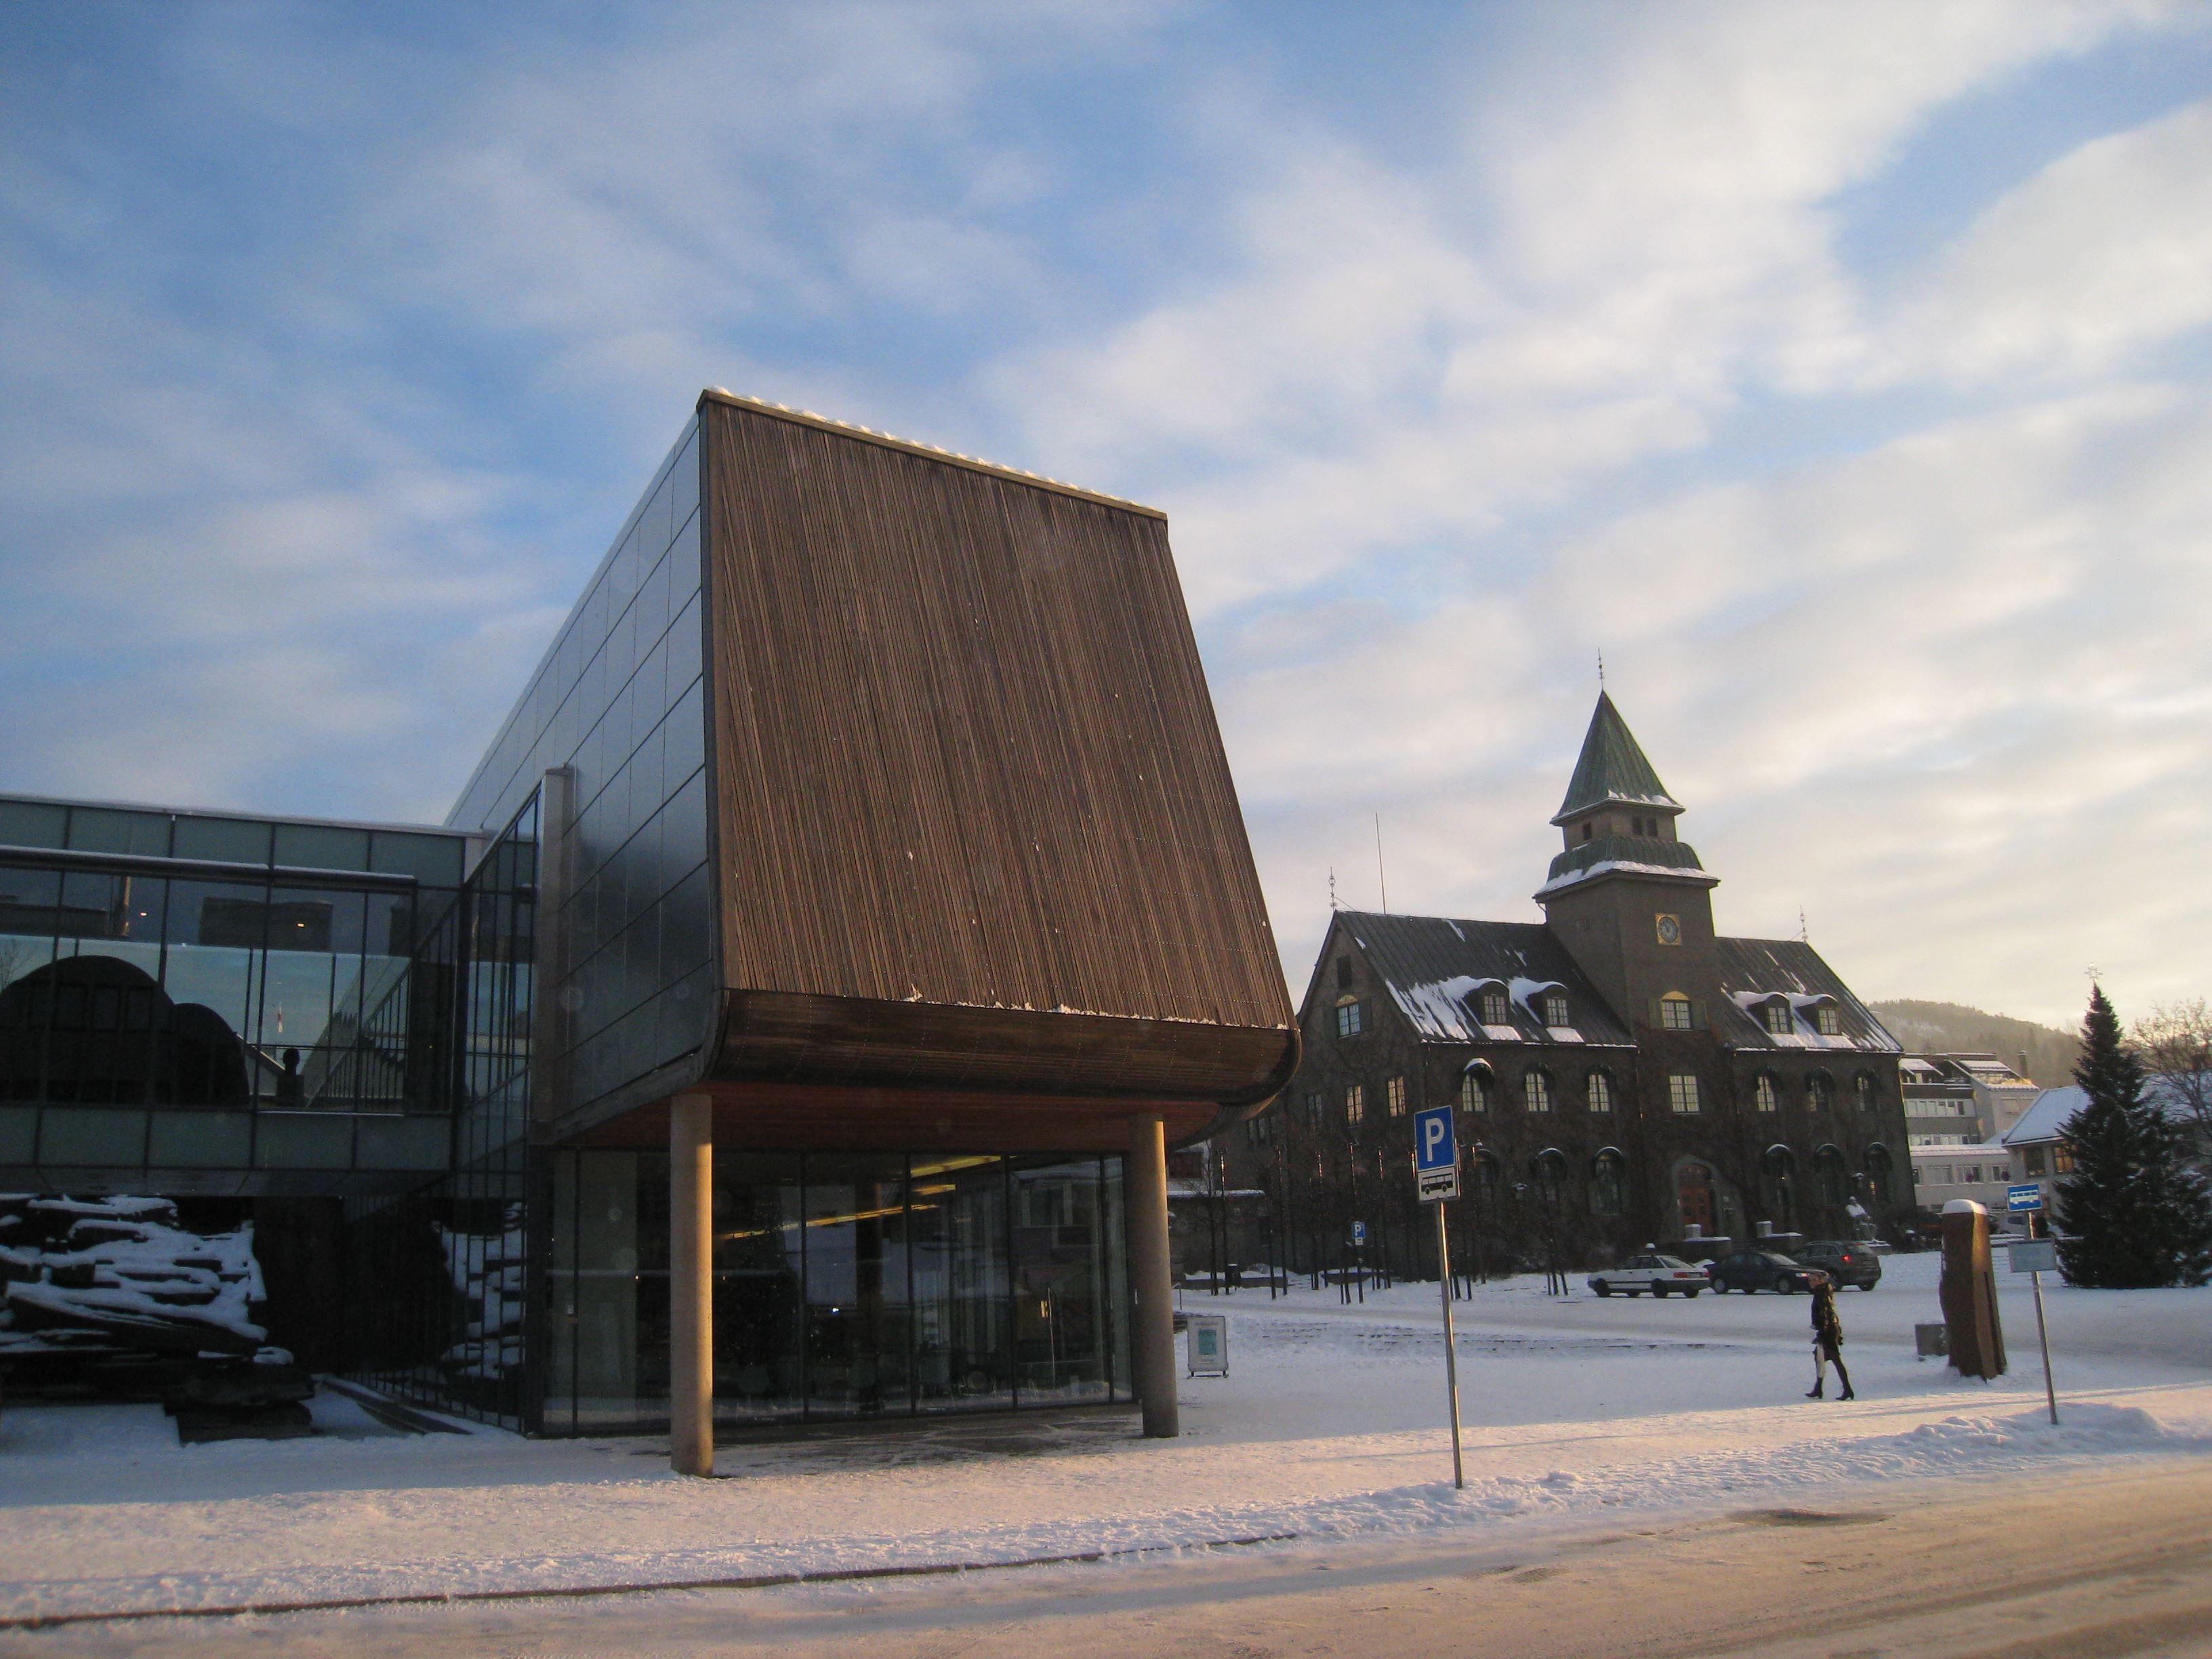 Lillehammer art museum in Norway